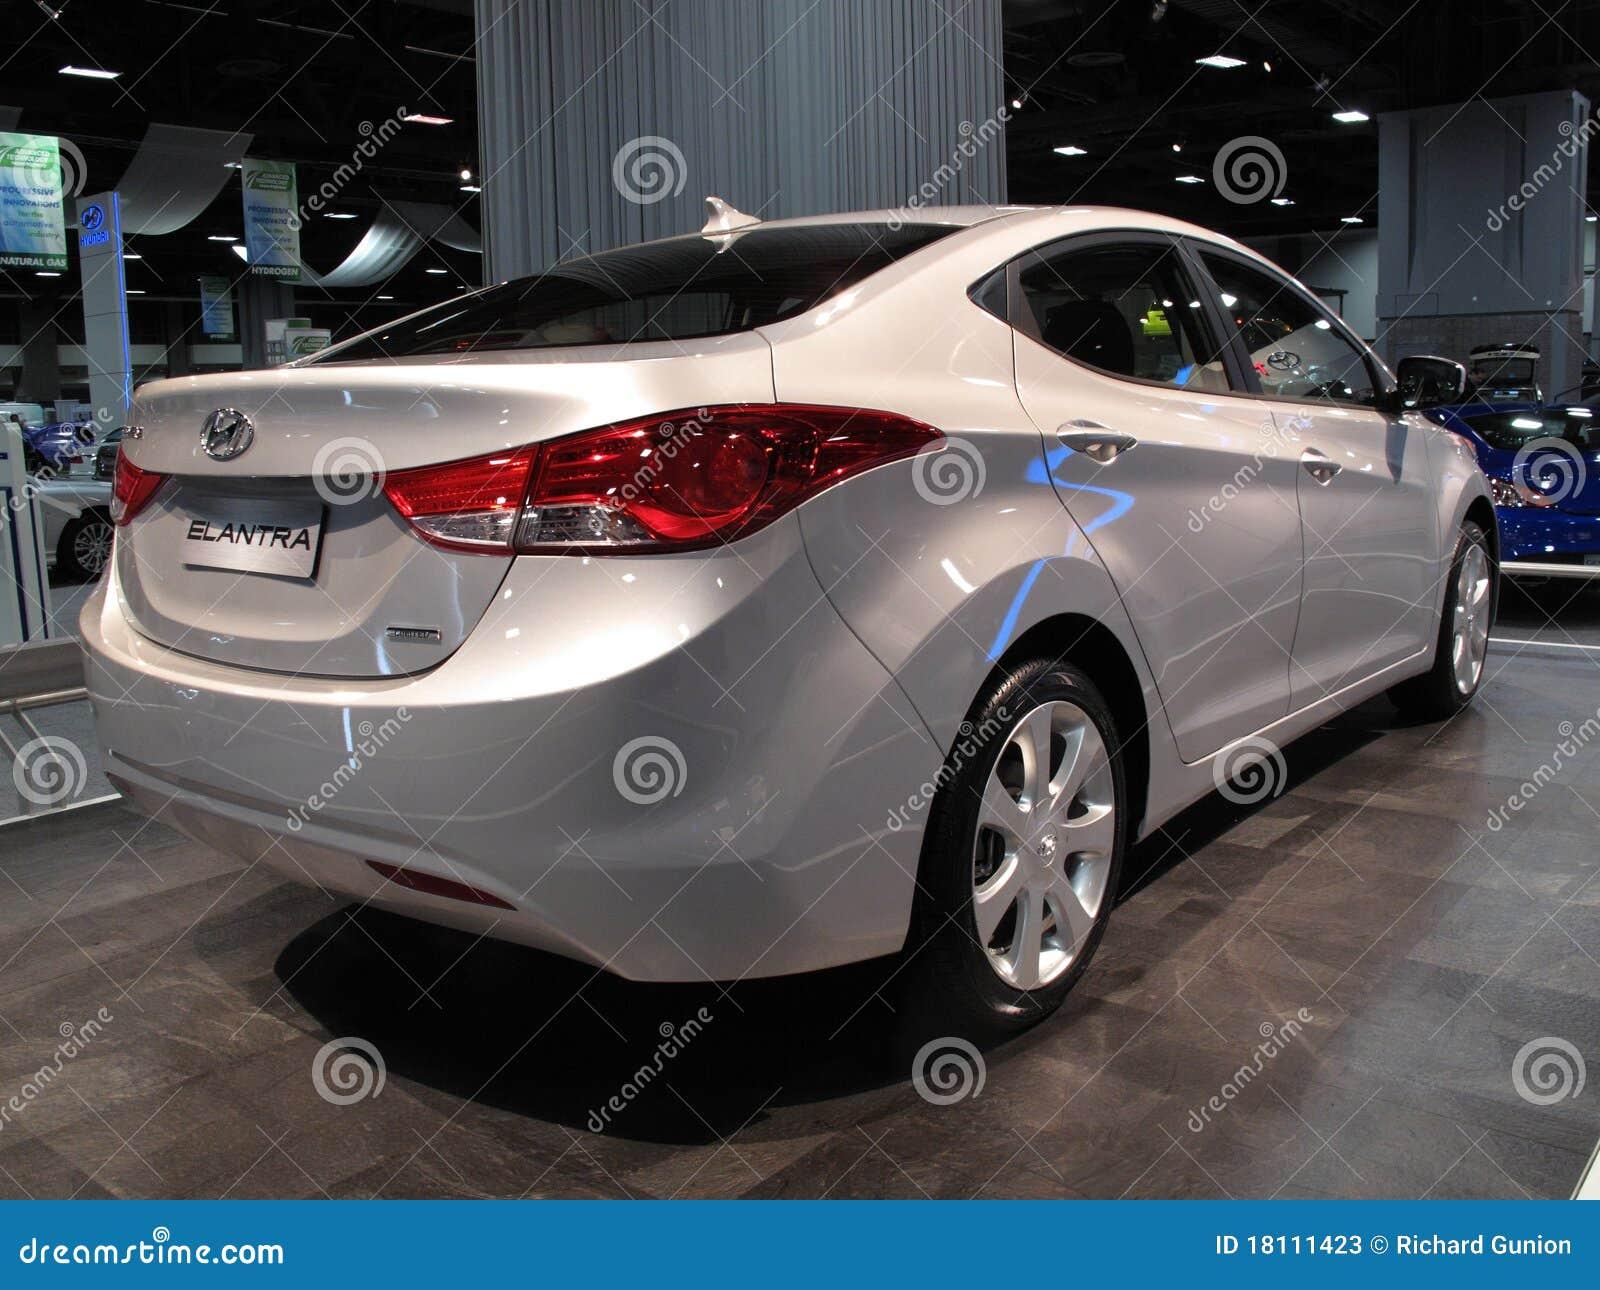 Hyundai Elantra Sedan Editorial Stock Photo Image Of